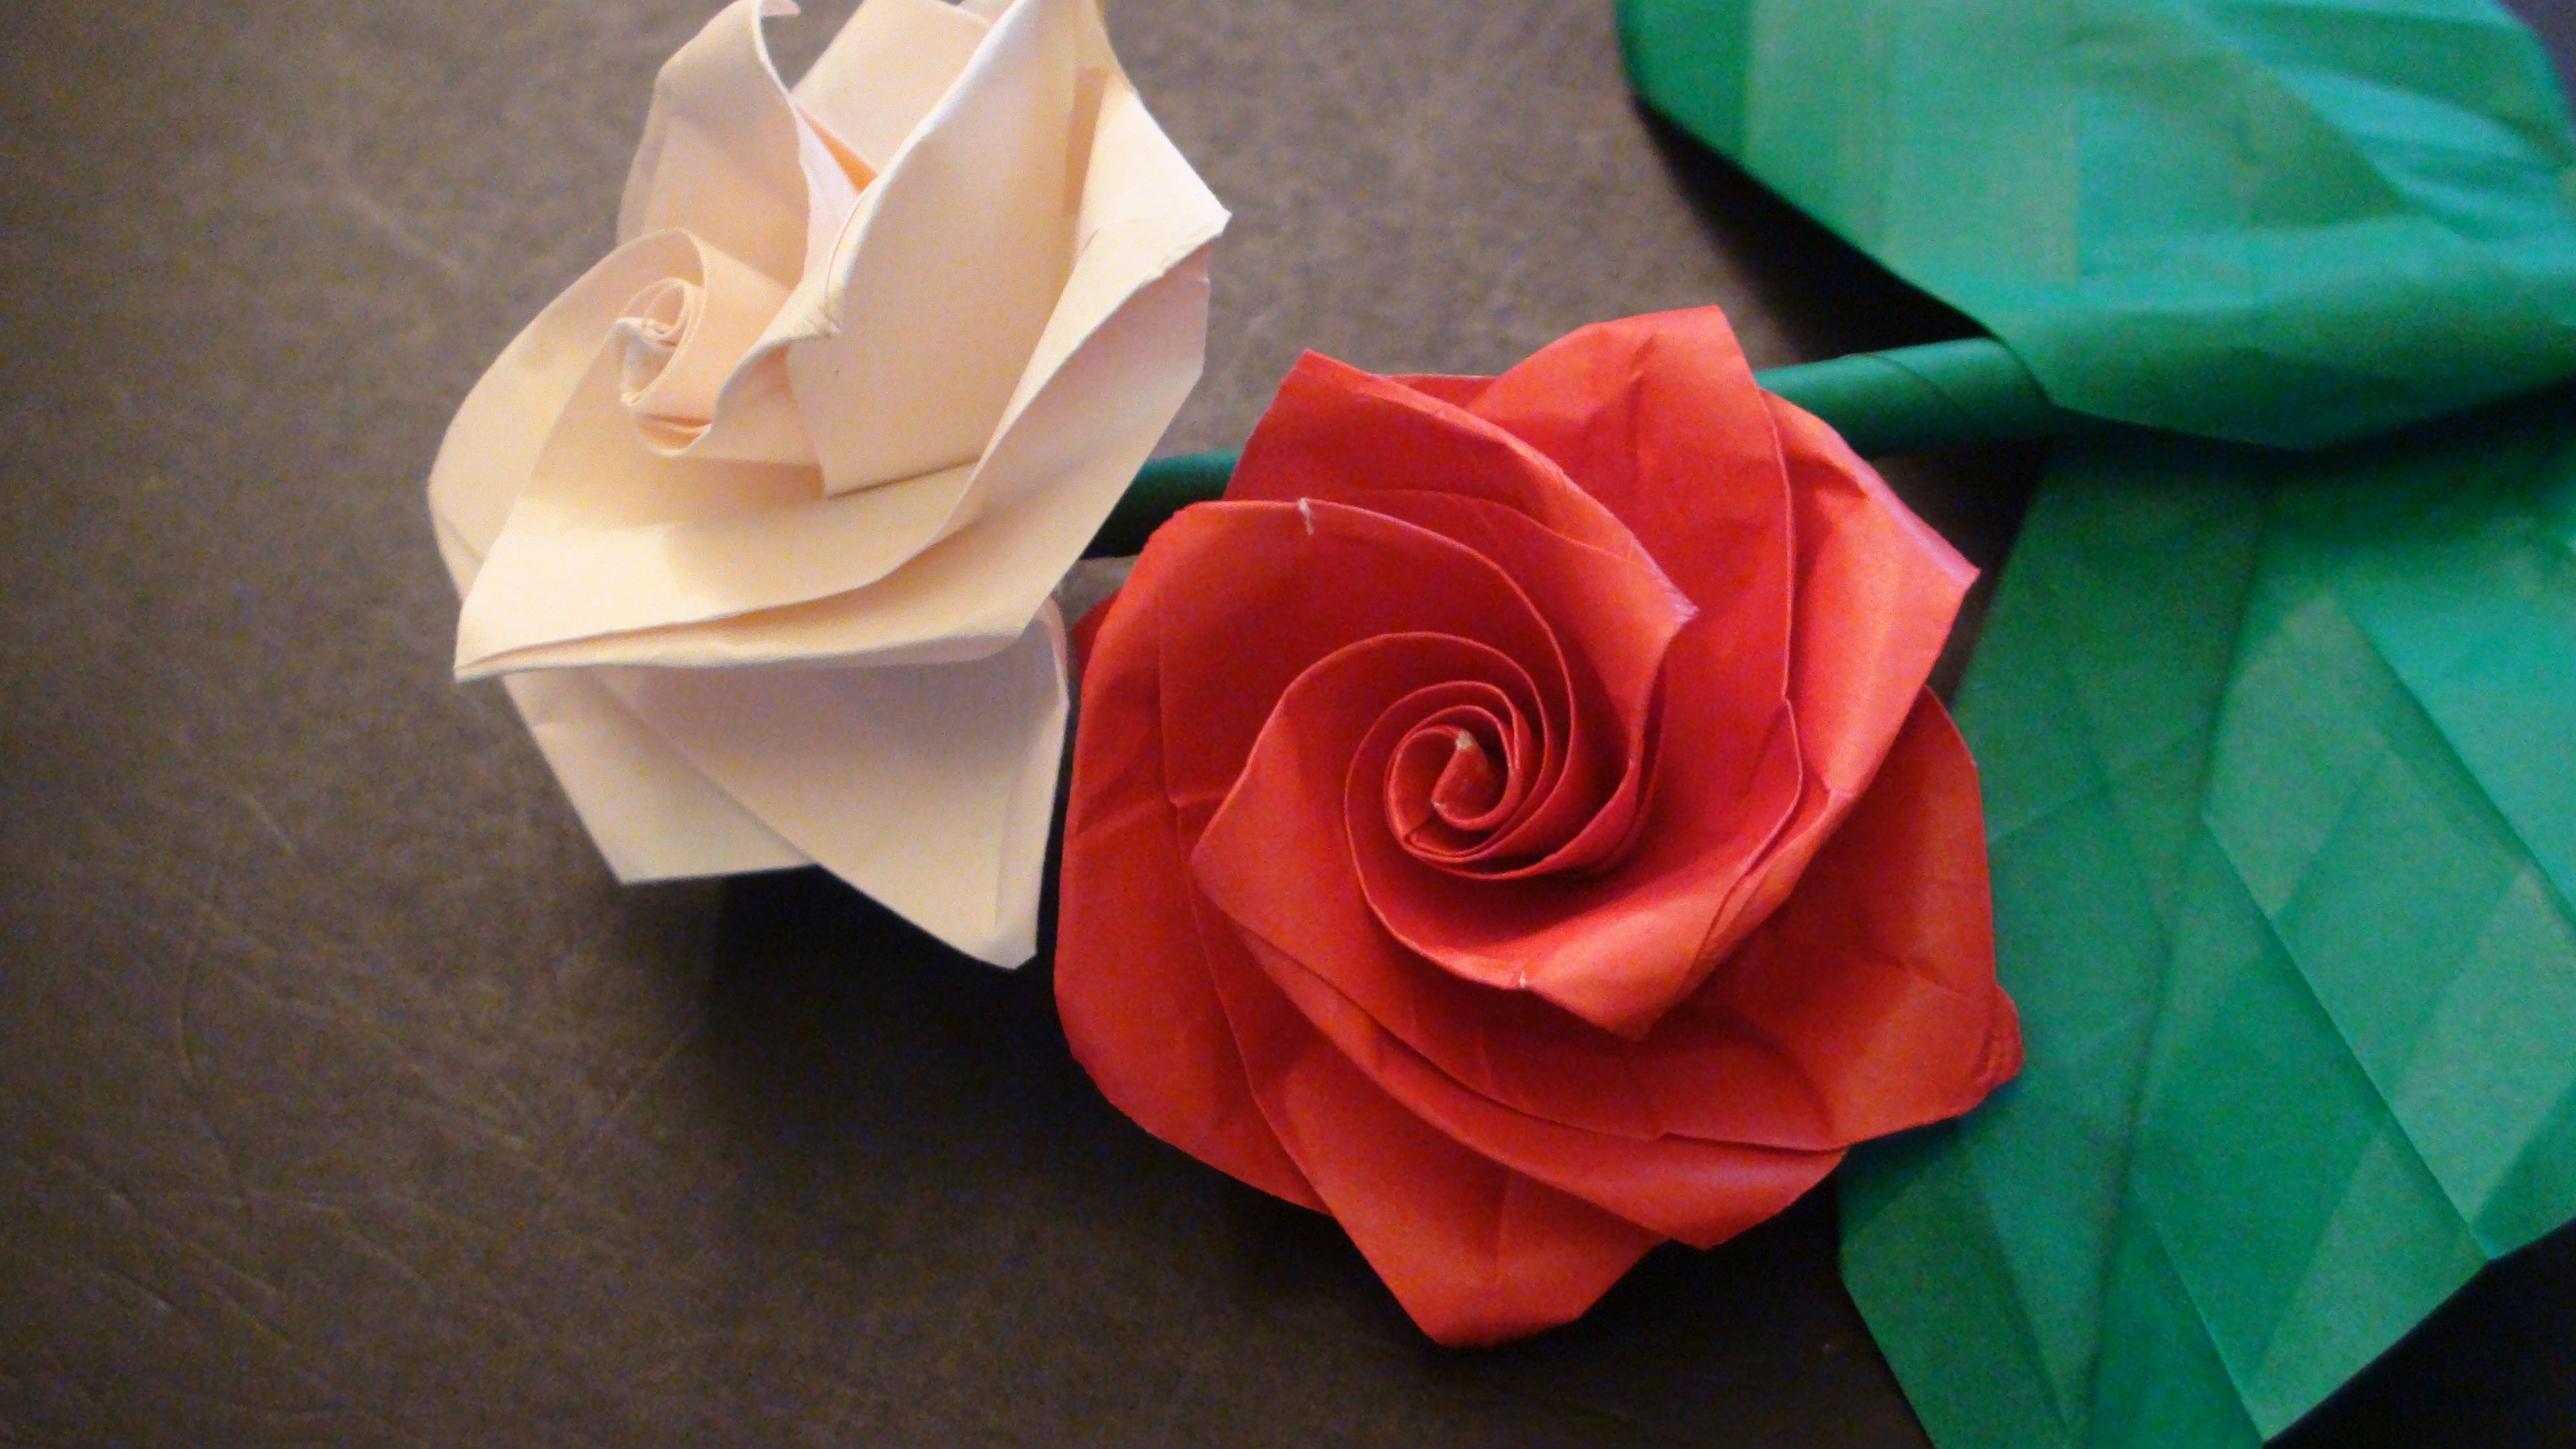 Origami Rose Easy - Origami Tutorial - YouTube | 2160x3840